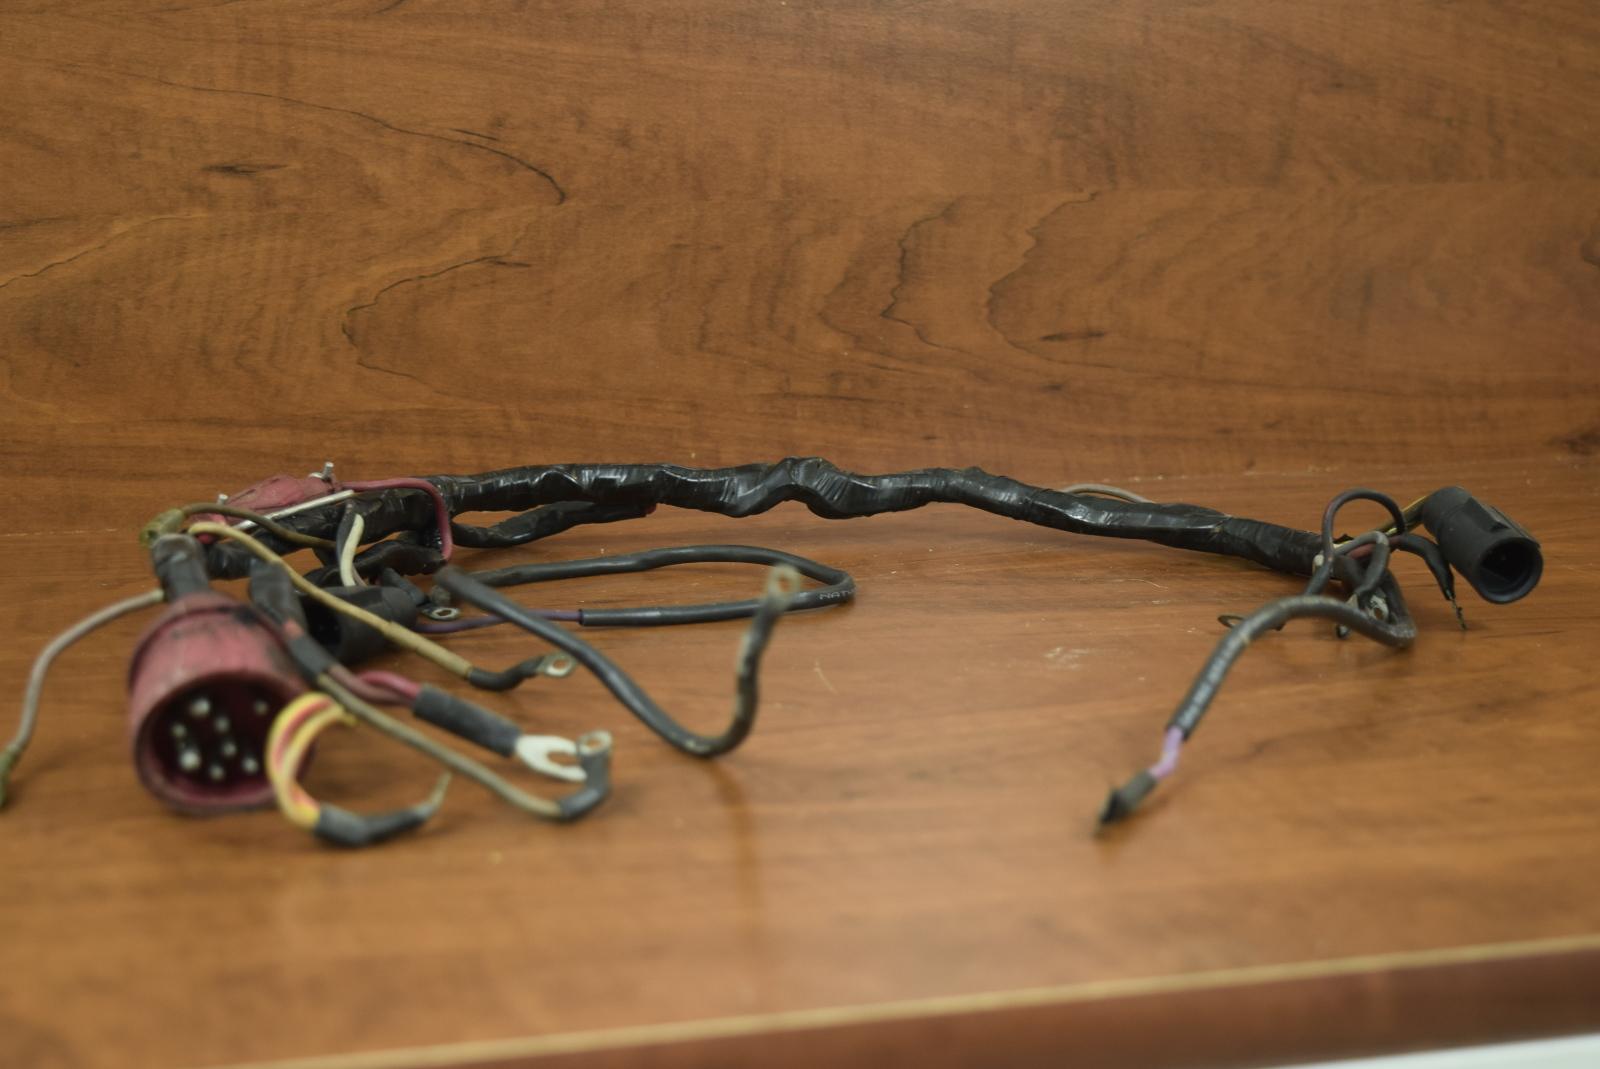 johnson evinrude motor cable wiring harness 583852 1989. Black Bedroom Furniture Sets. Home Design Ideas